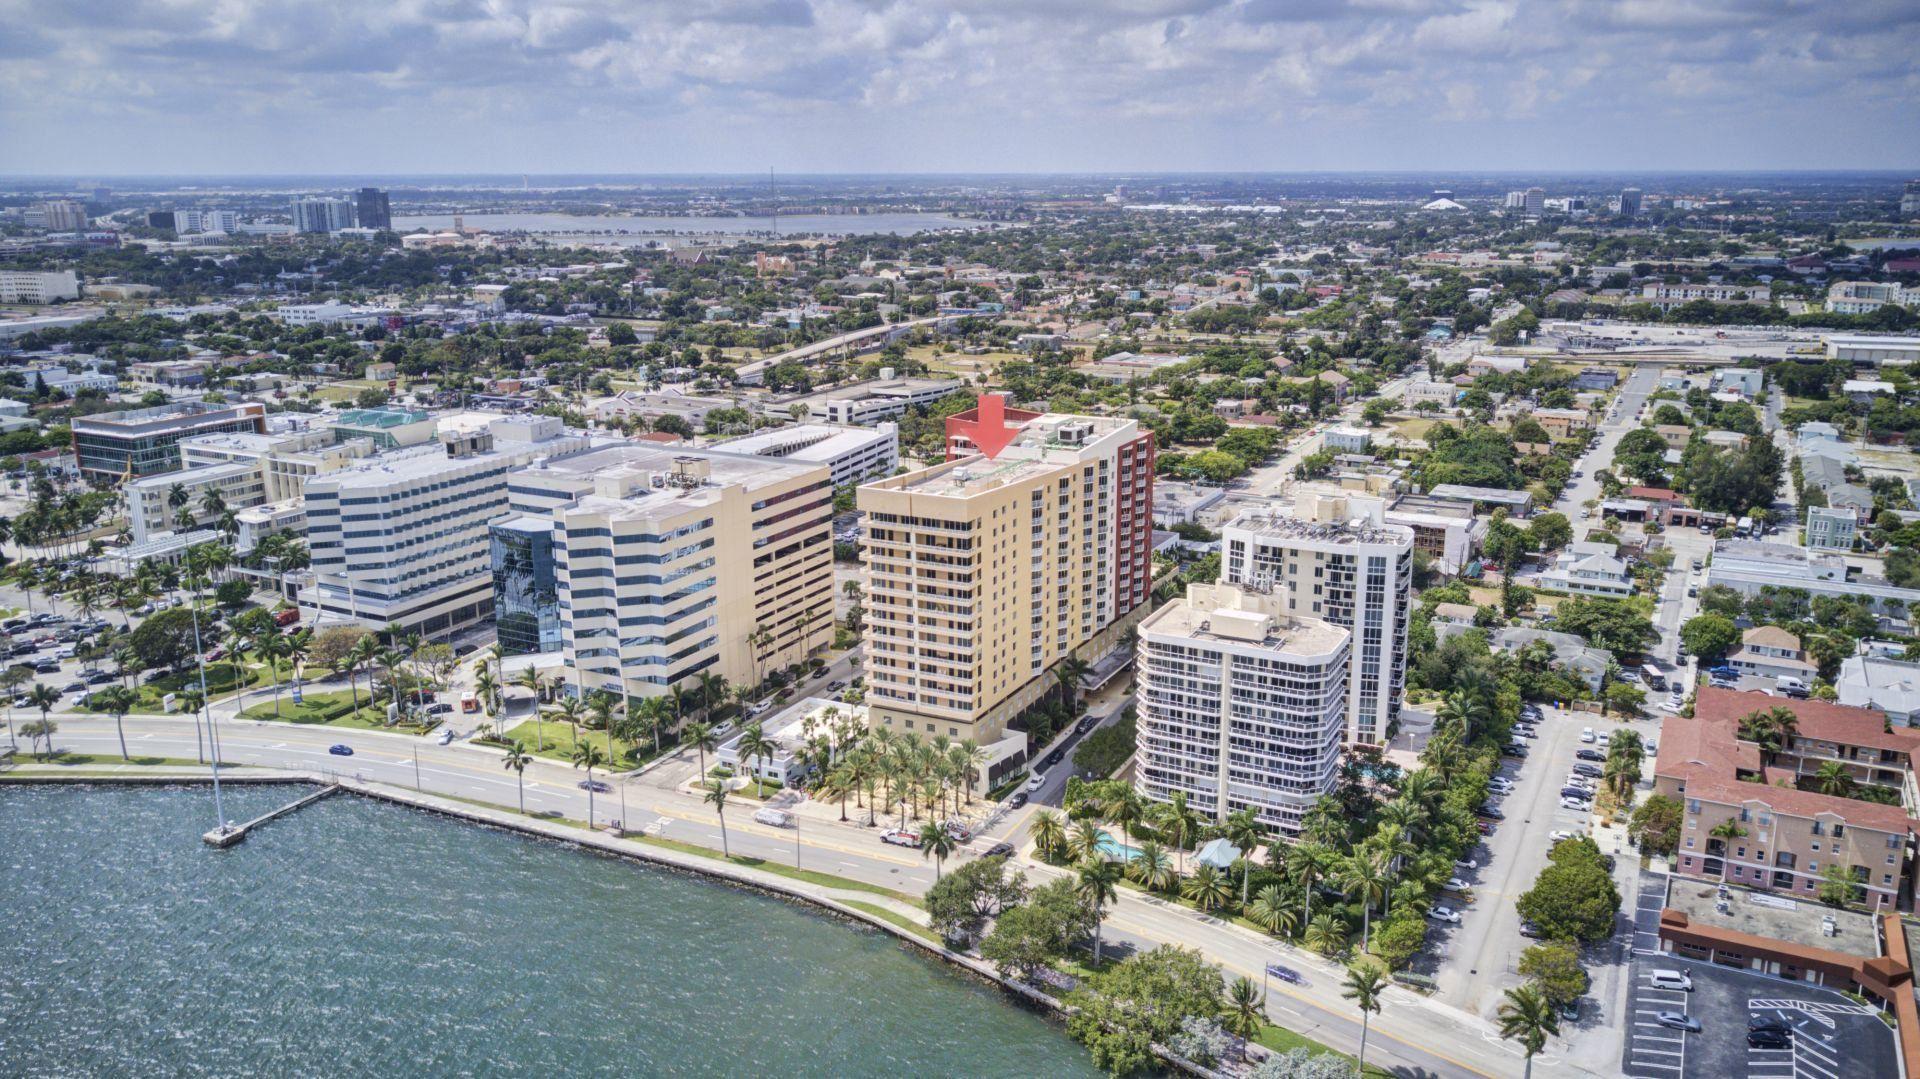 1551 N Flagler Drive #601, West Palm Beach, FL 33401 - #: RX-10620894